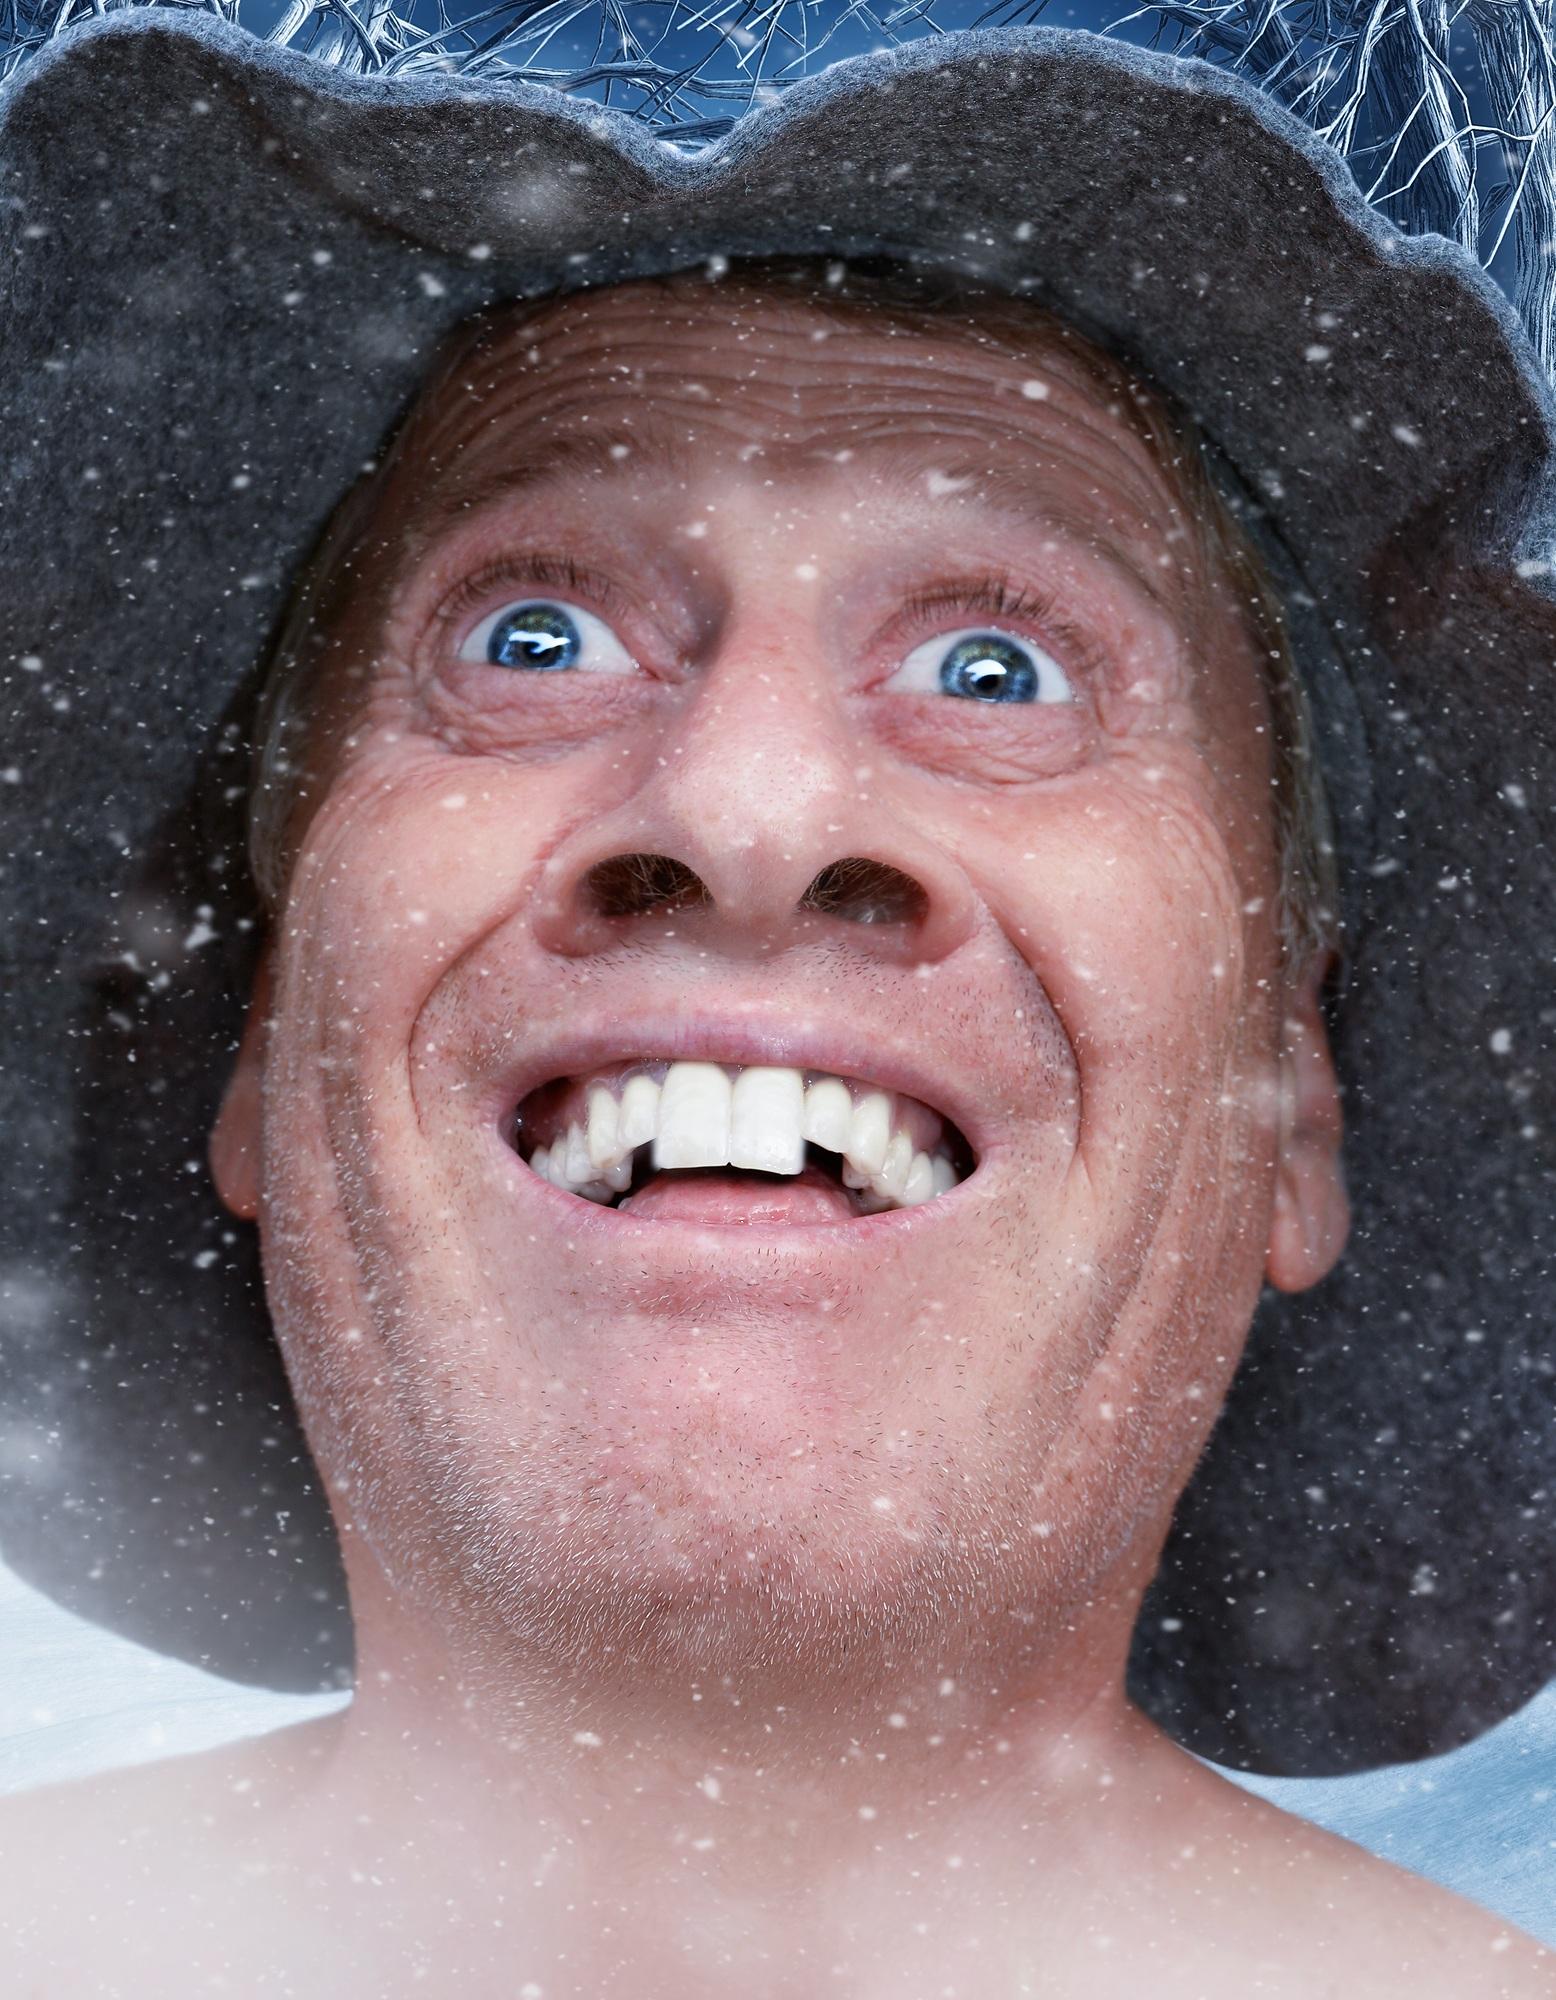 Gambar Orang Musim Dingin Rambut Pria Potret Anak Biru